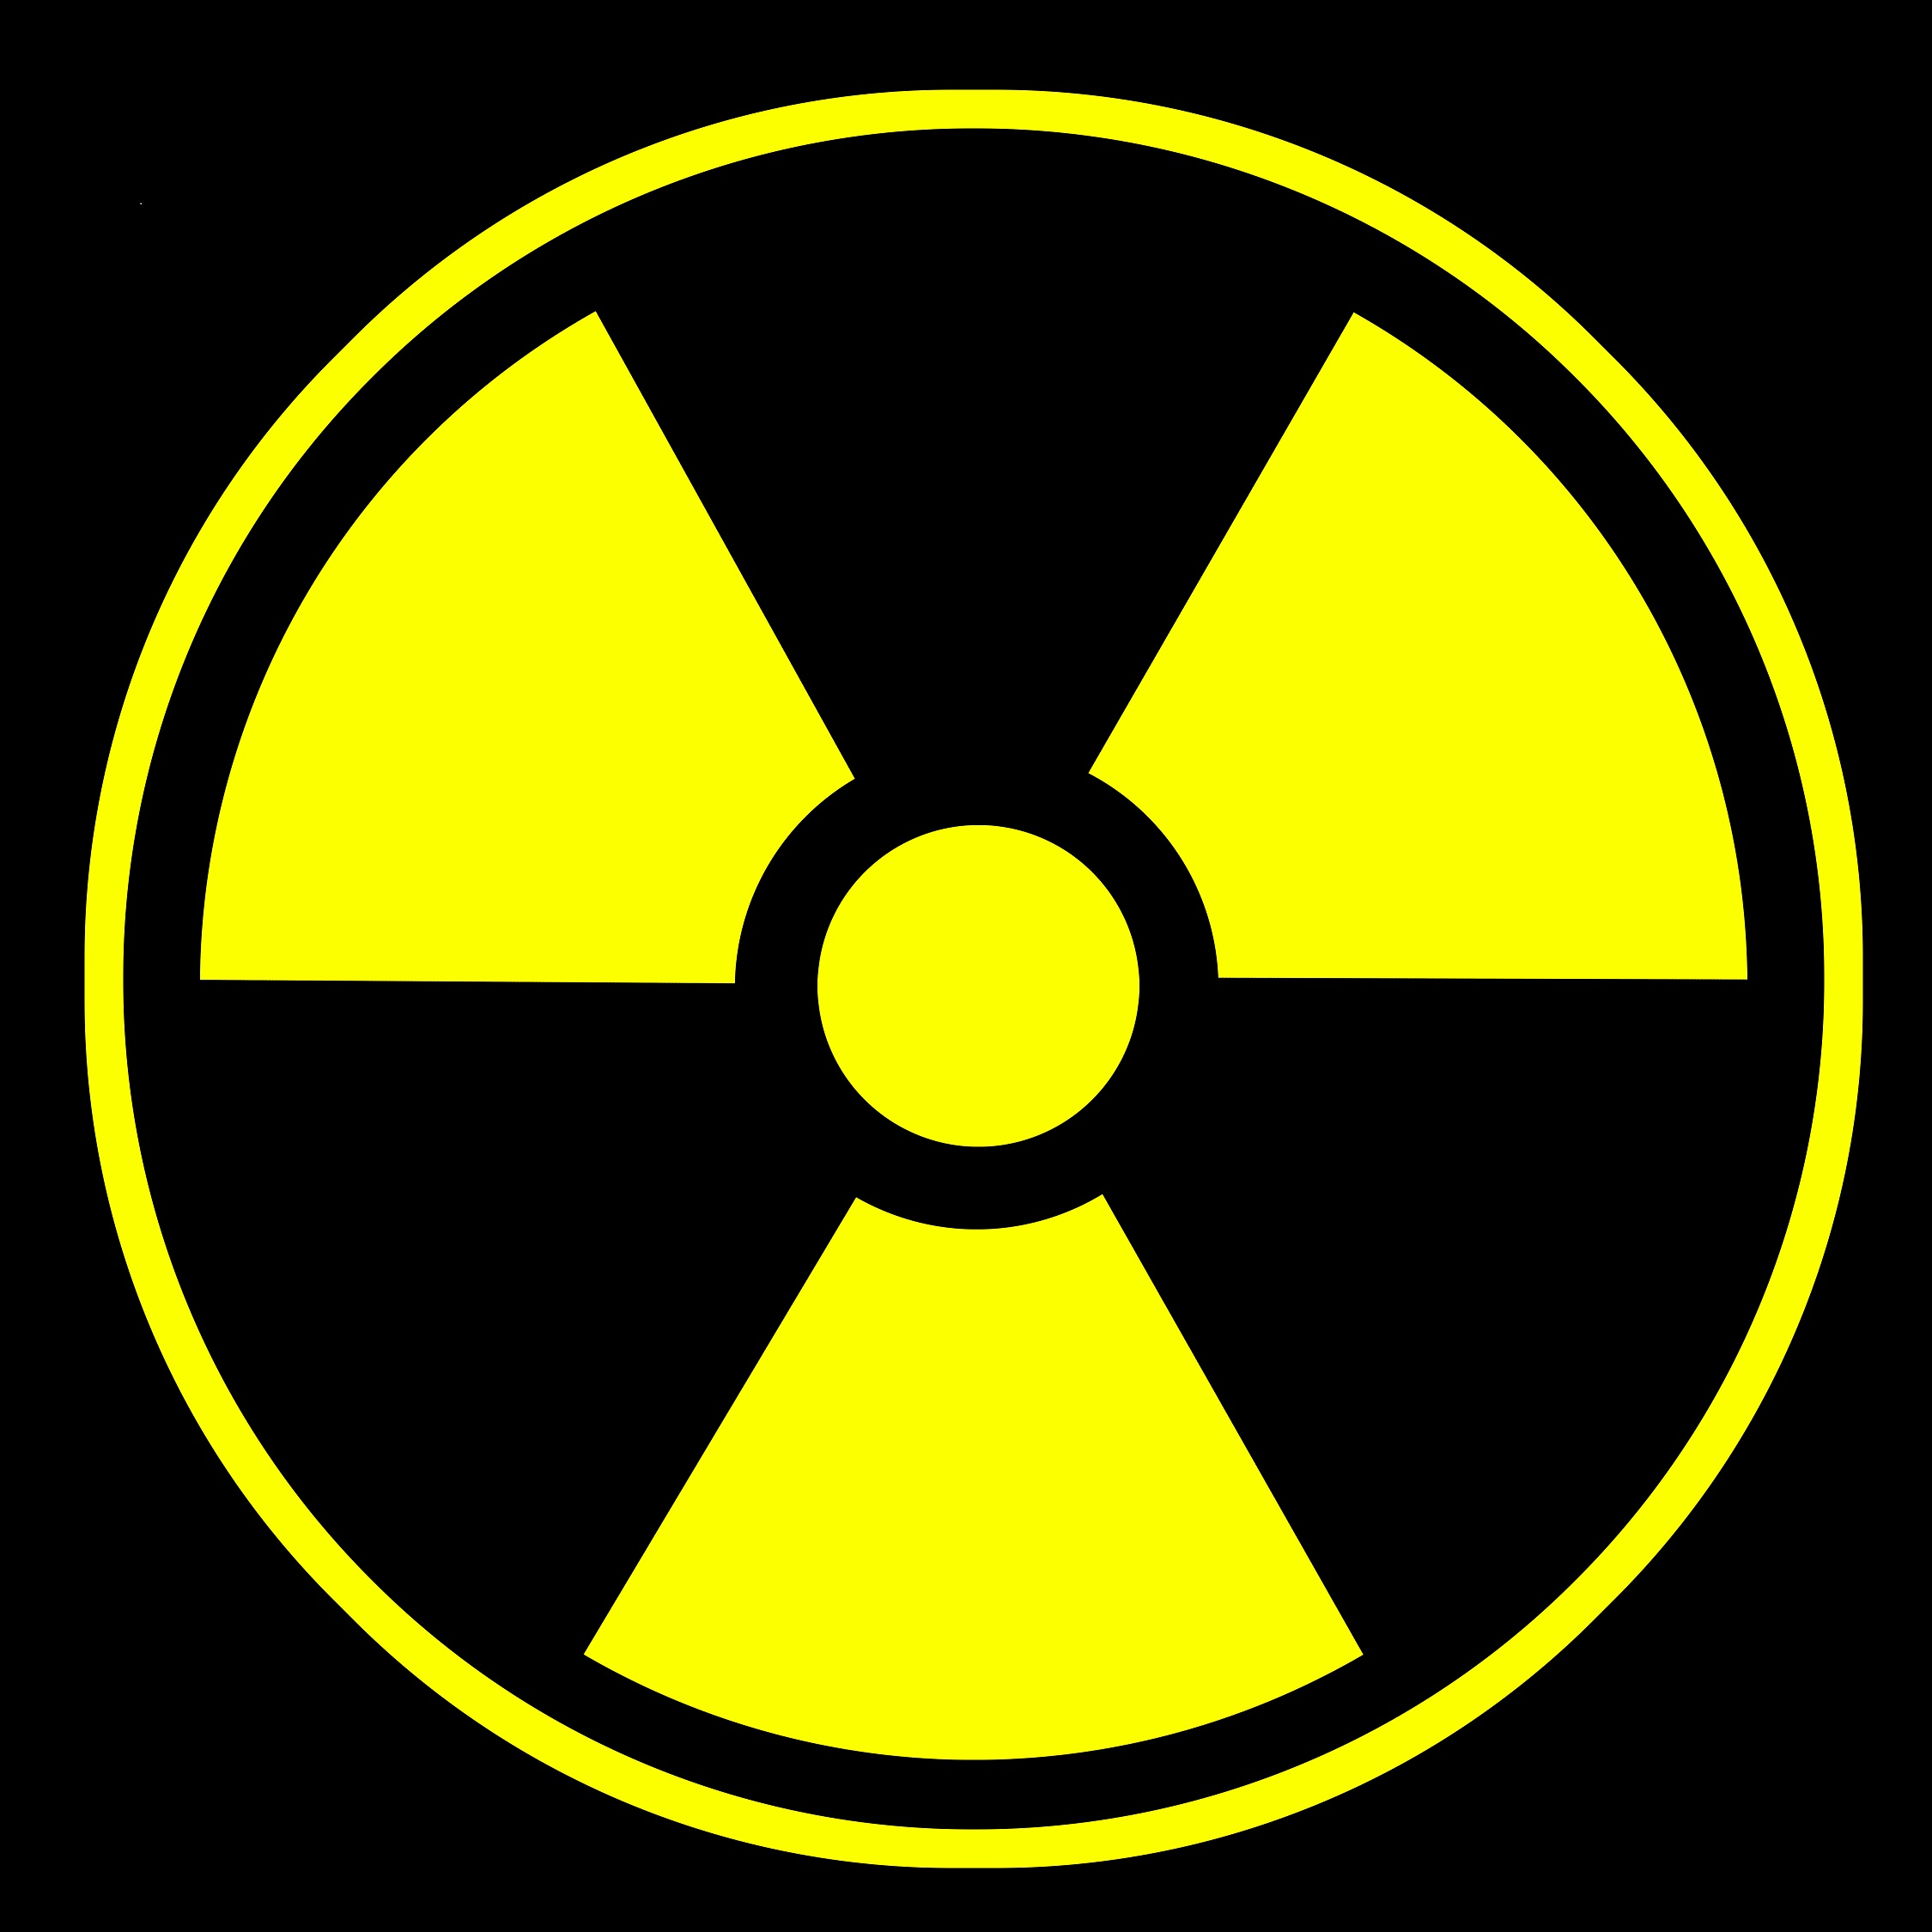 Toxic HD wallpapers, Desktop wallpaper - most viewed